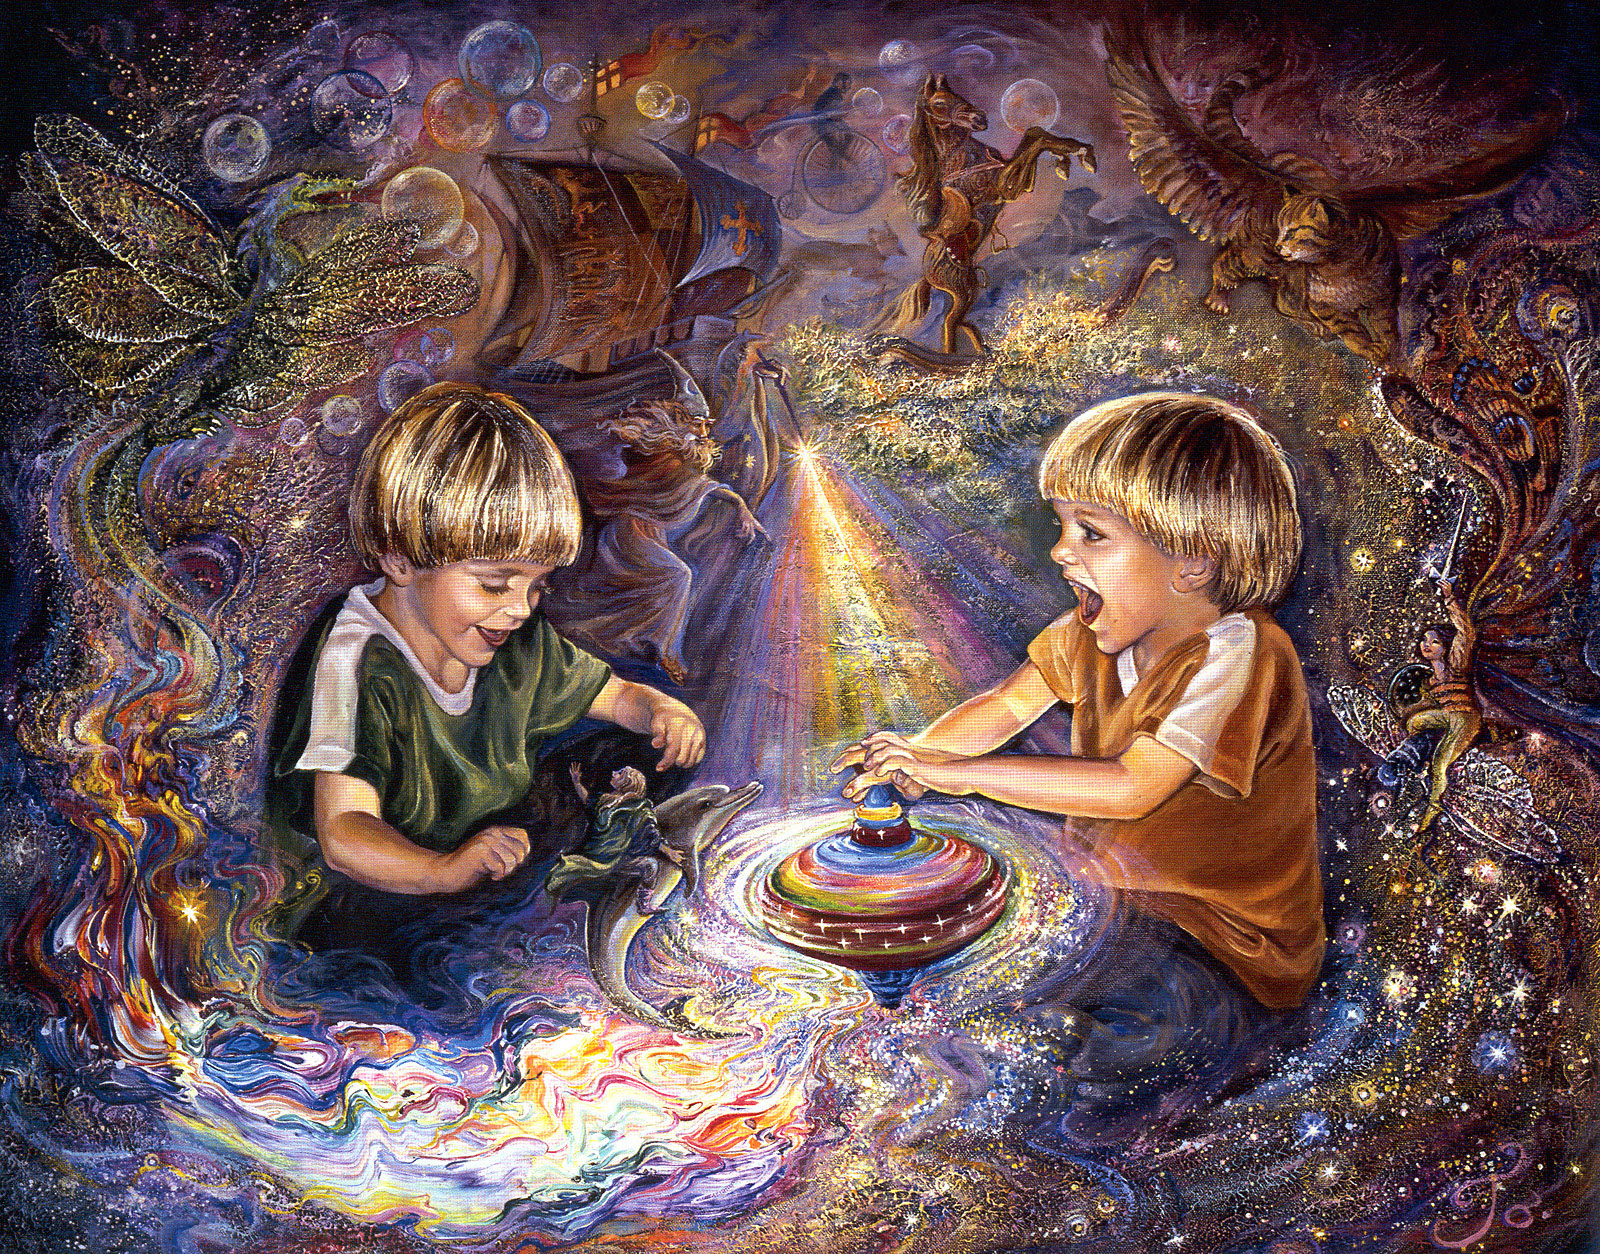 josephine_wall_children_the magic spinning top